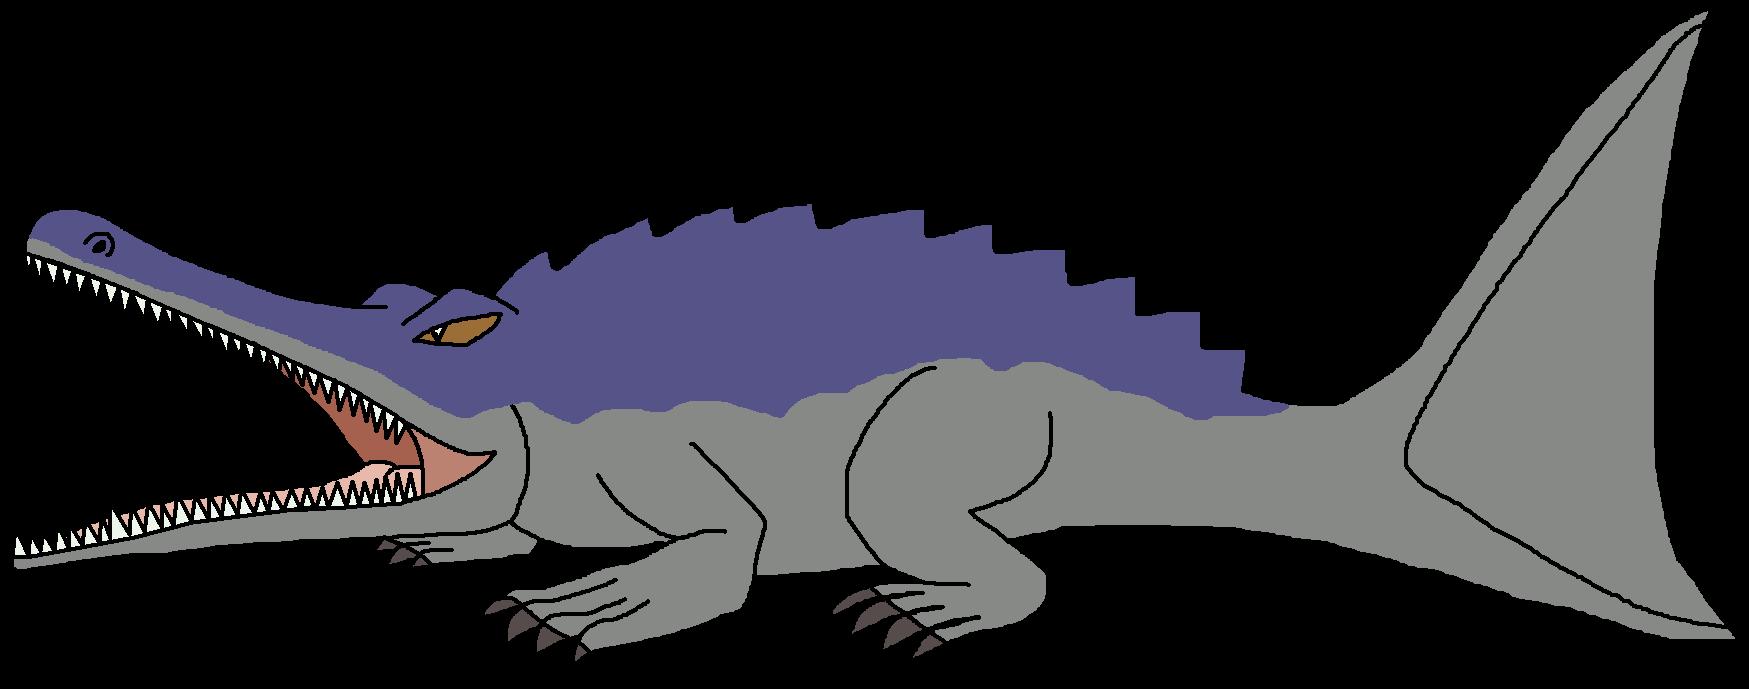 Metriorhynchus dinosaur pedia wikia. Nest clipart alligator